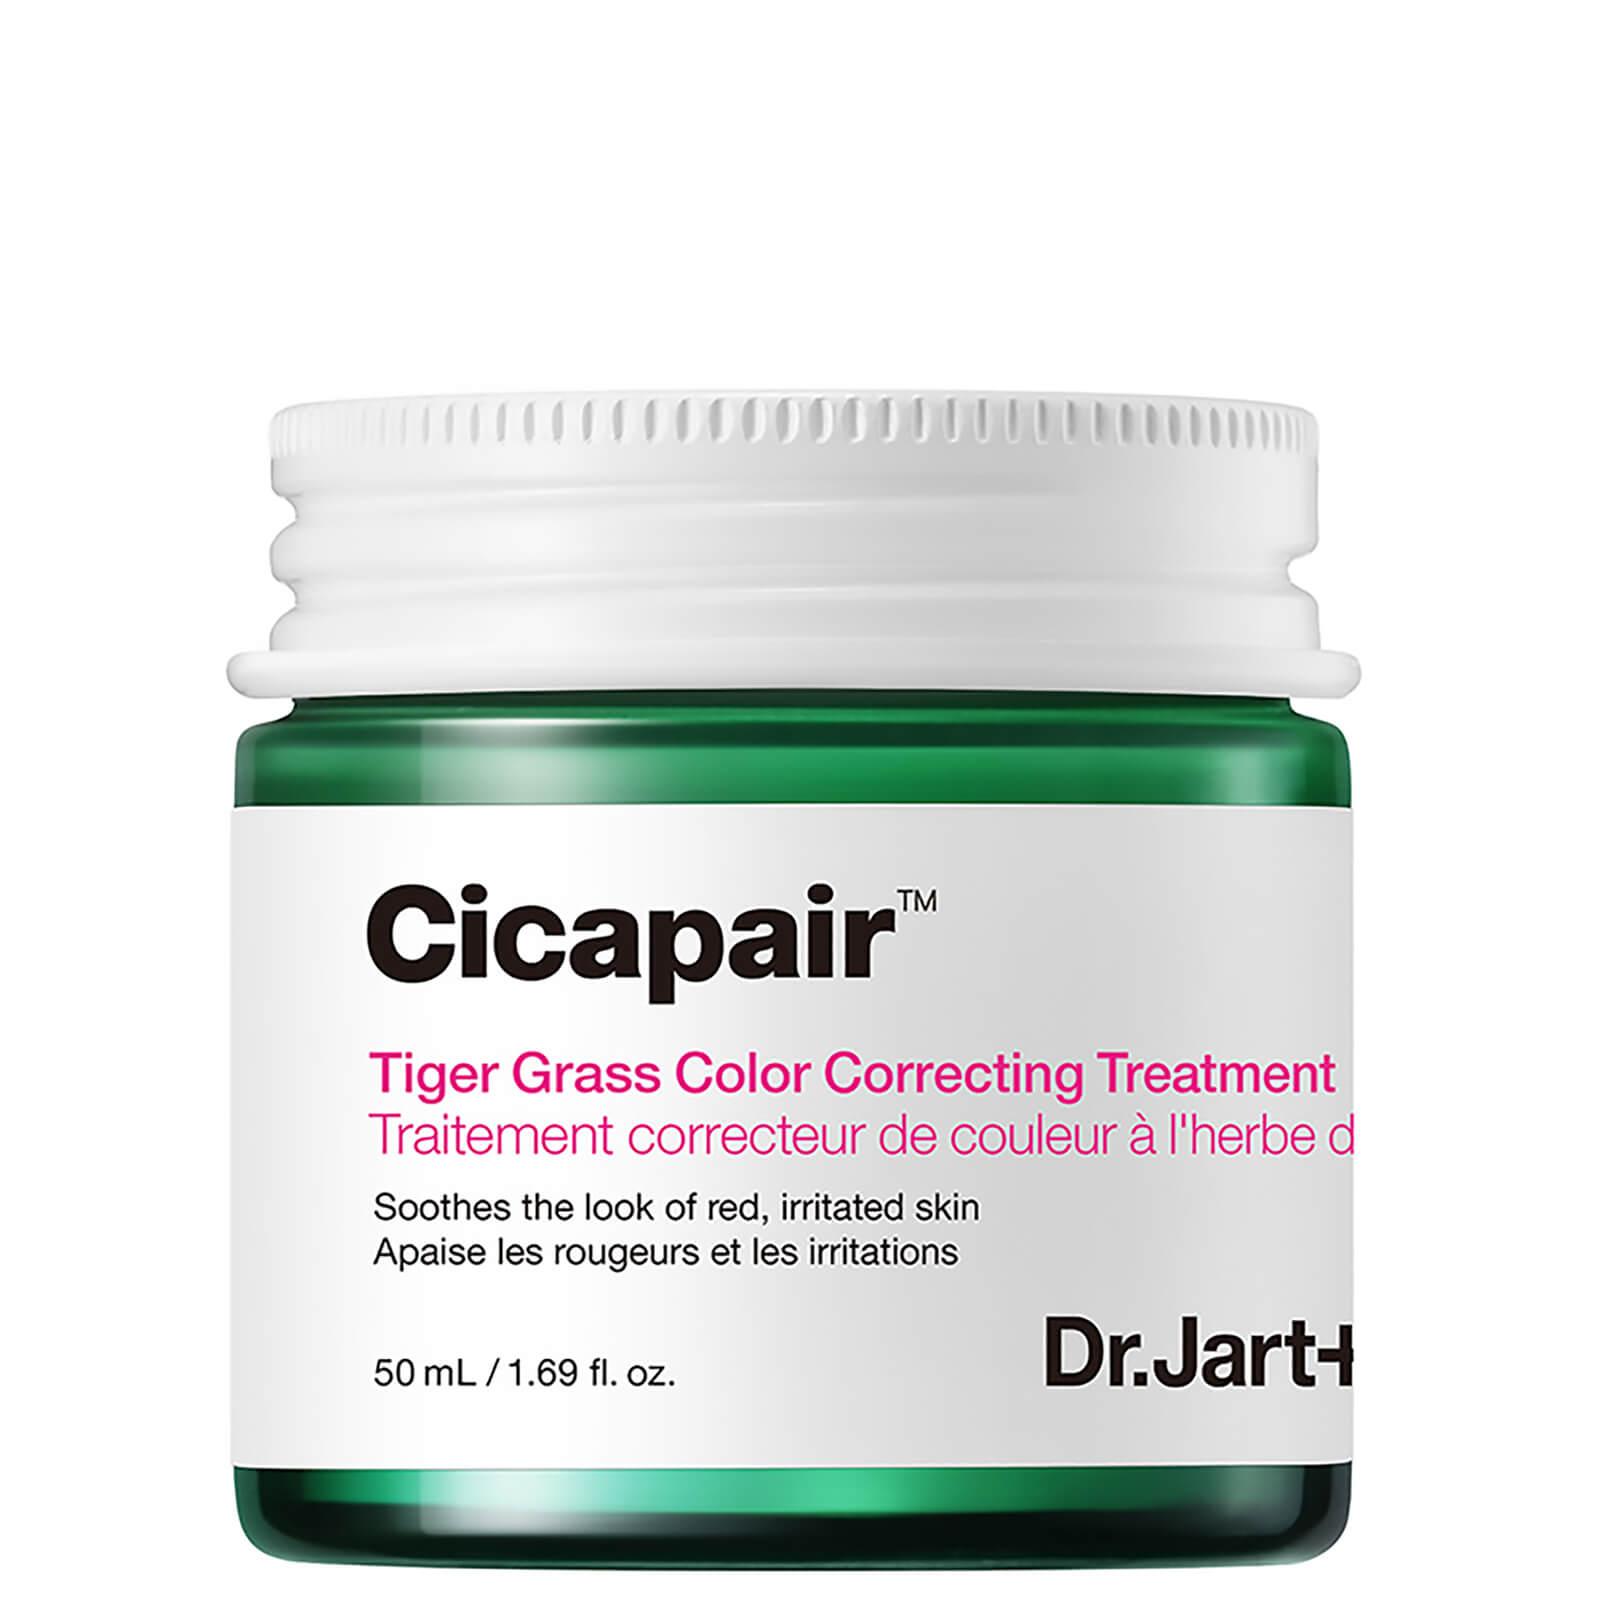 Dr. Jart+ Cicapair Tiger Grass Color Correcting Treatment 50ml